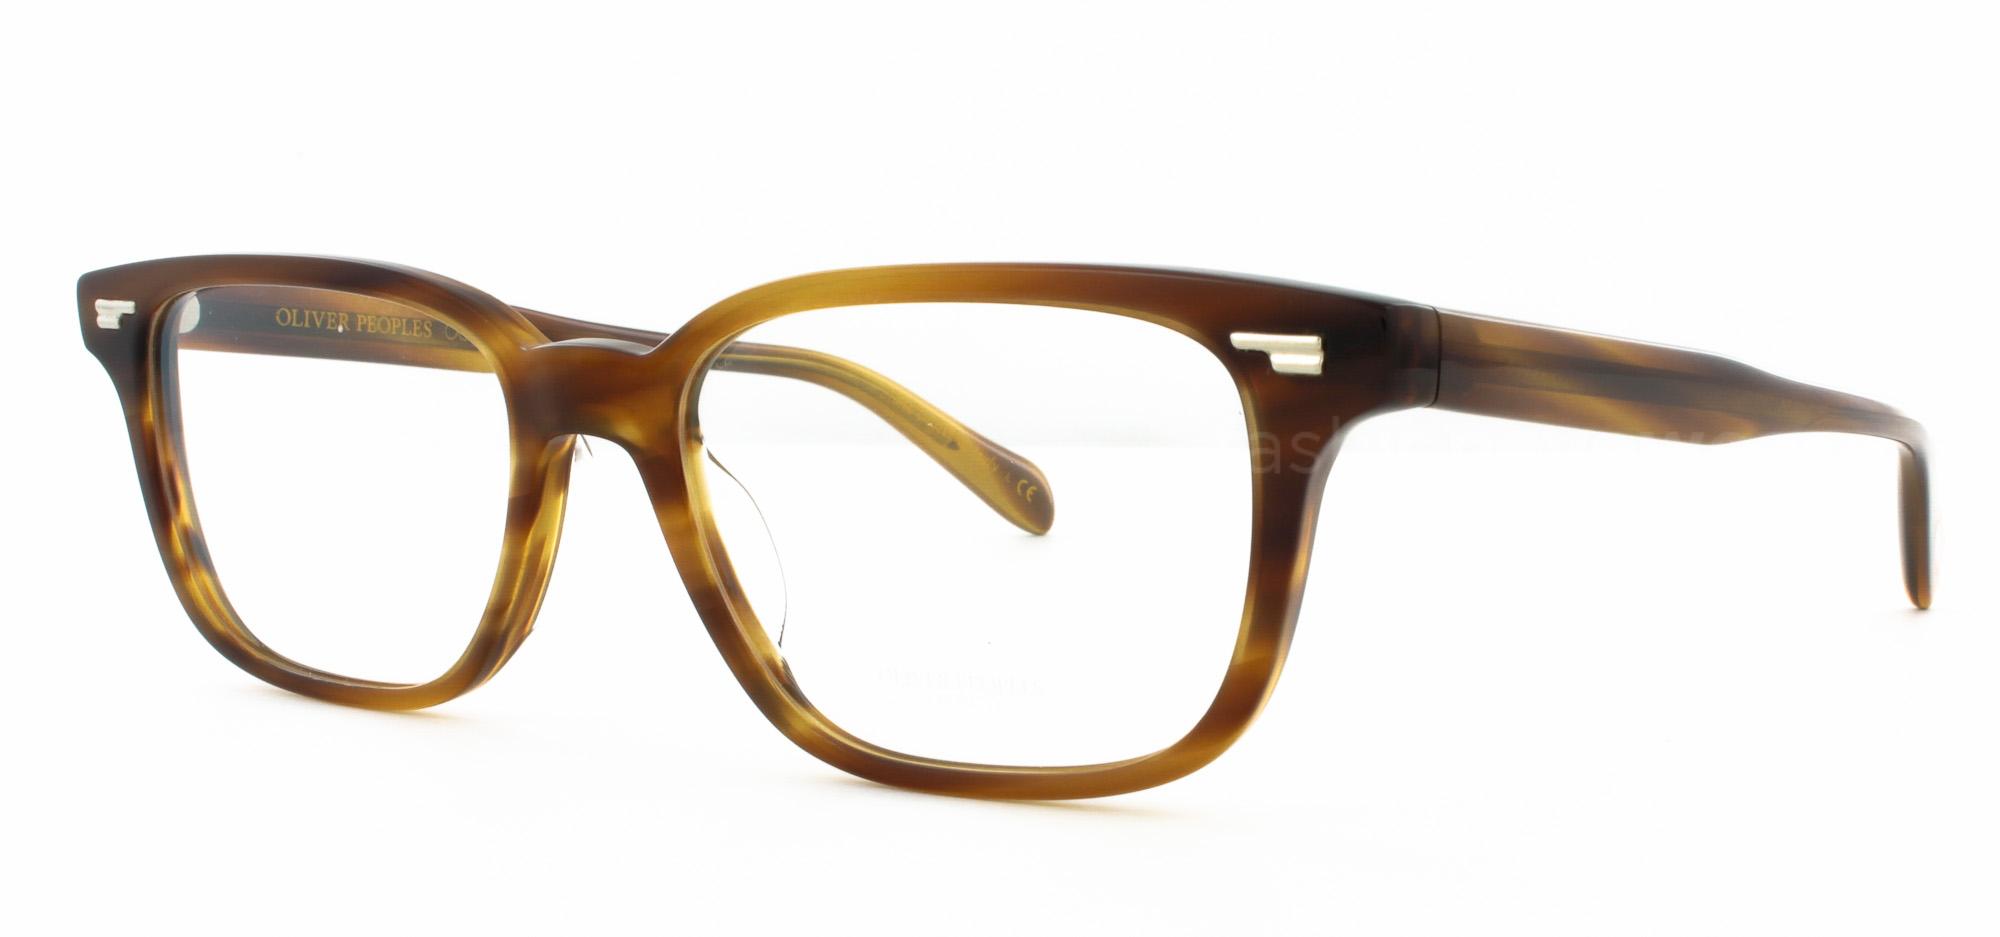 Oliver peoples ov5280u eyeglasses for Decor my eyes